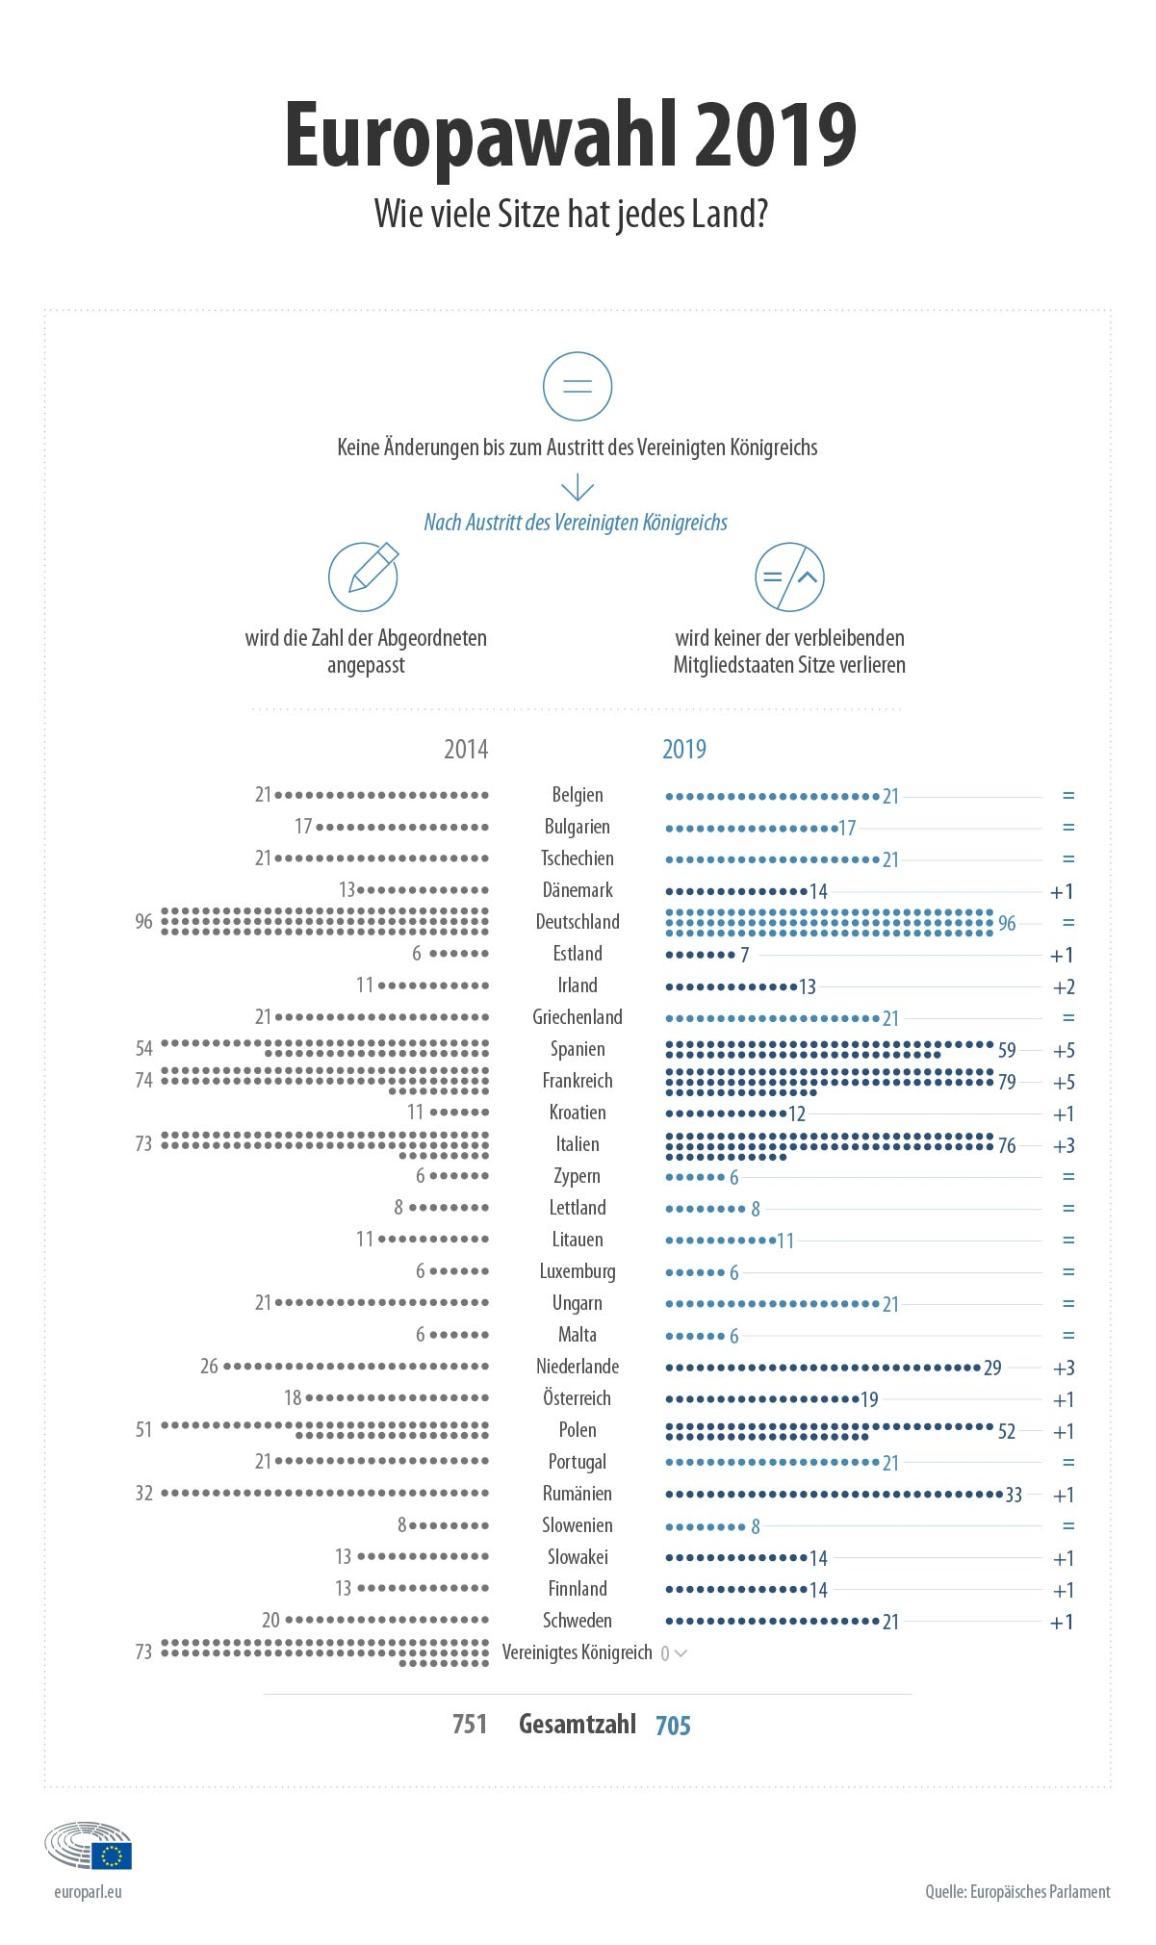 Illustration - Sitze pro Mitgliedstaat